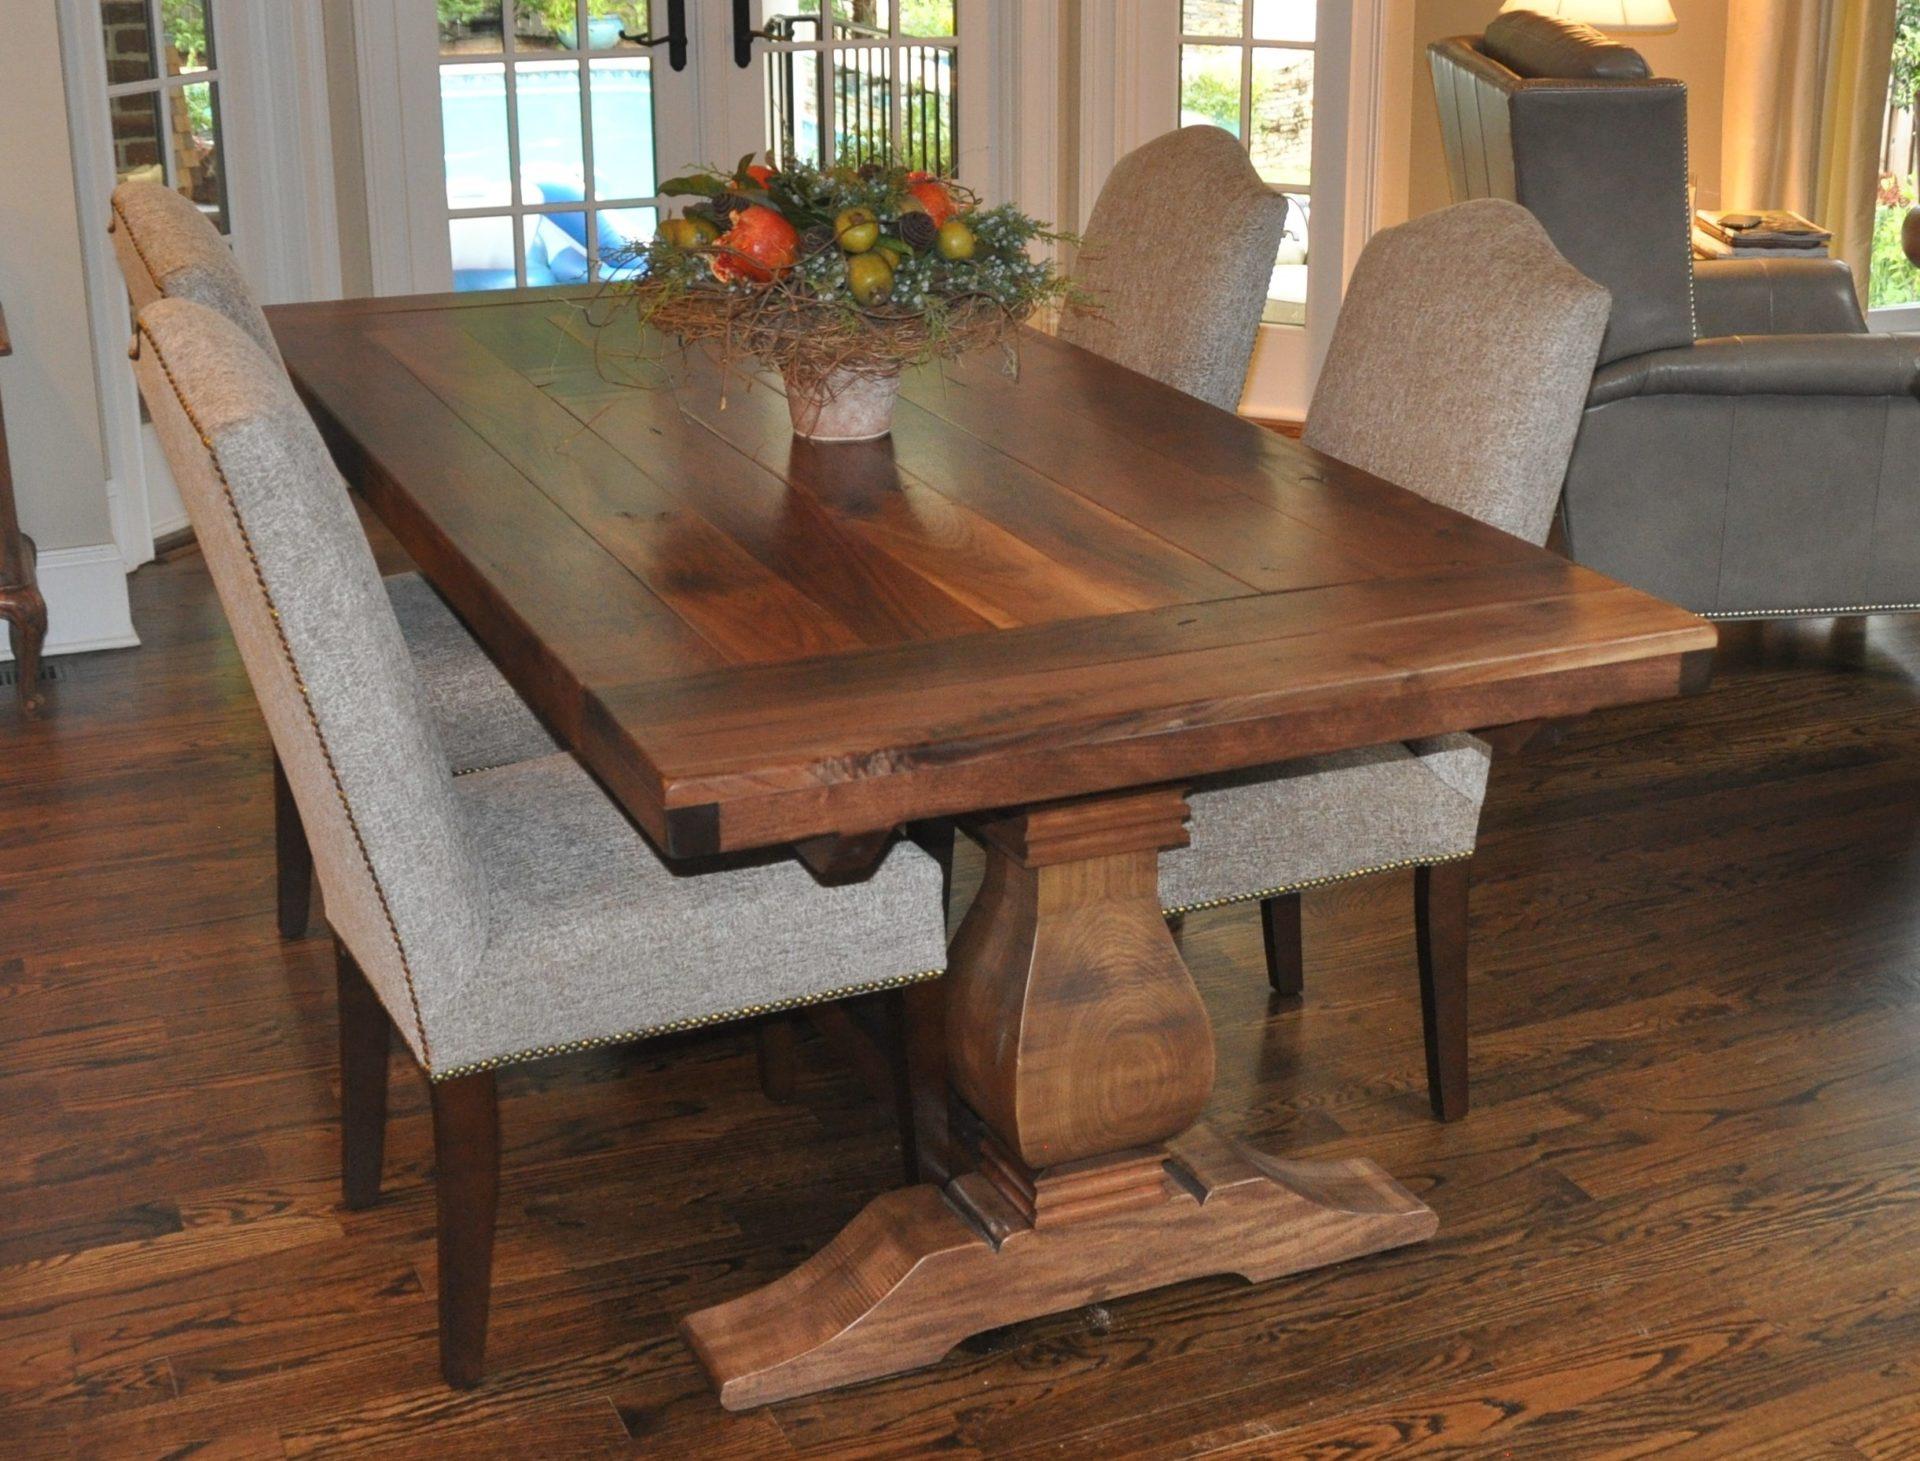 rustic weston trestle farmhouse table atlanta ga denver co rustic trades furniture. Black Bedroom Furniture Sets. Home Design Ideas